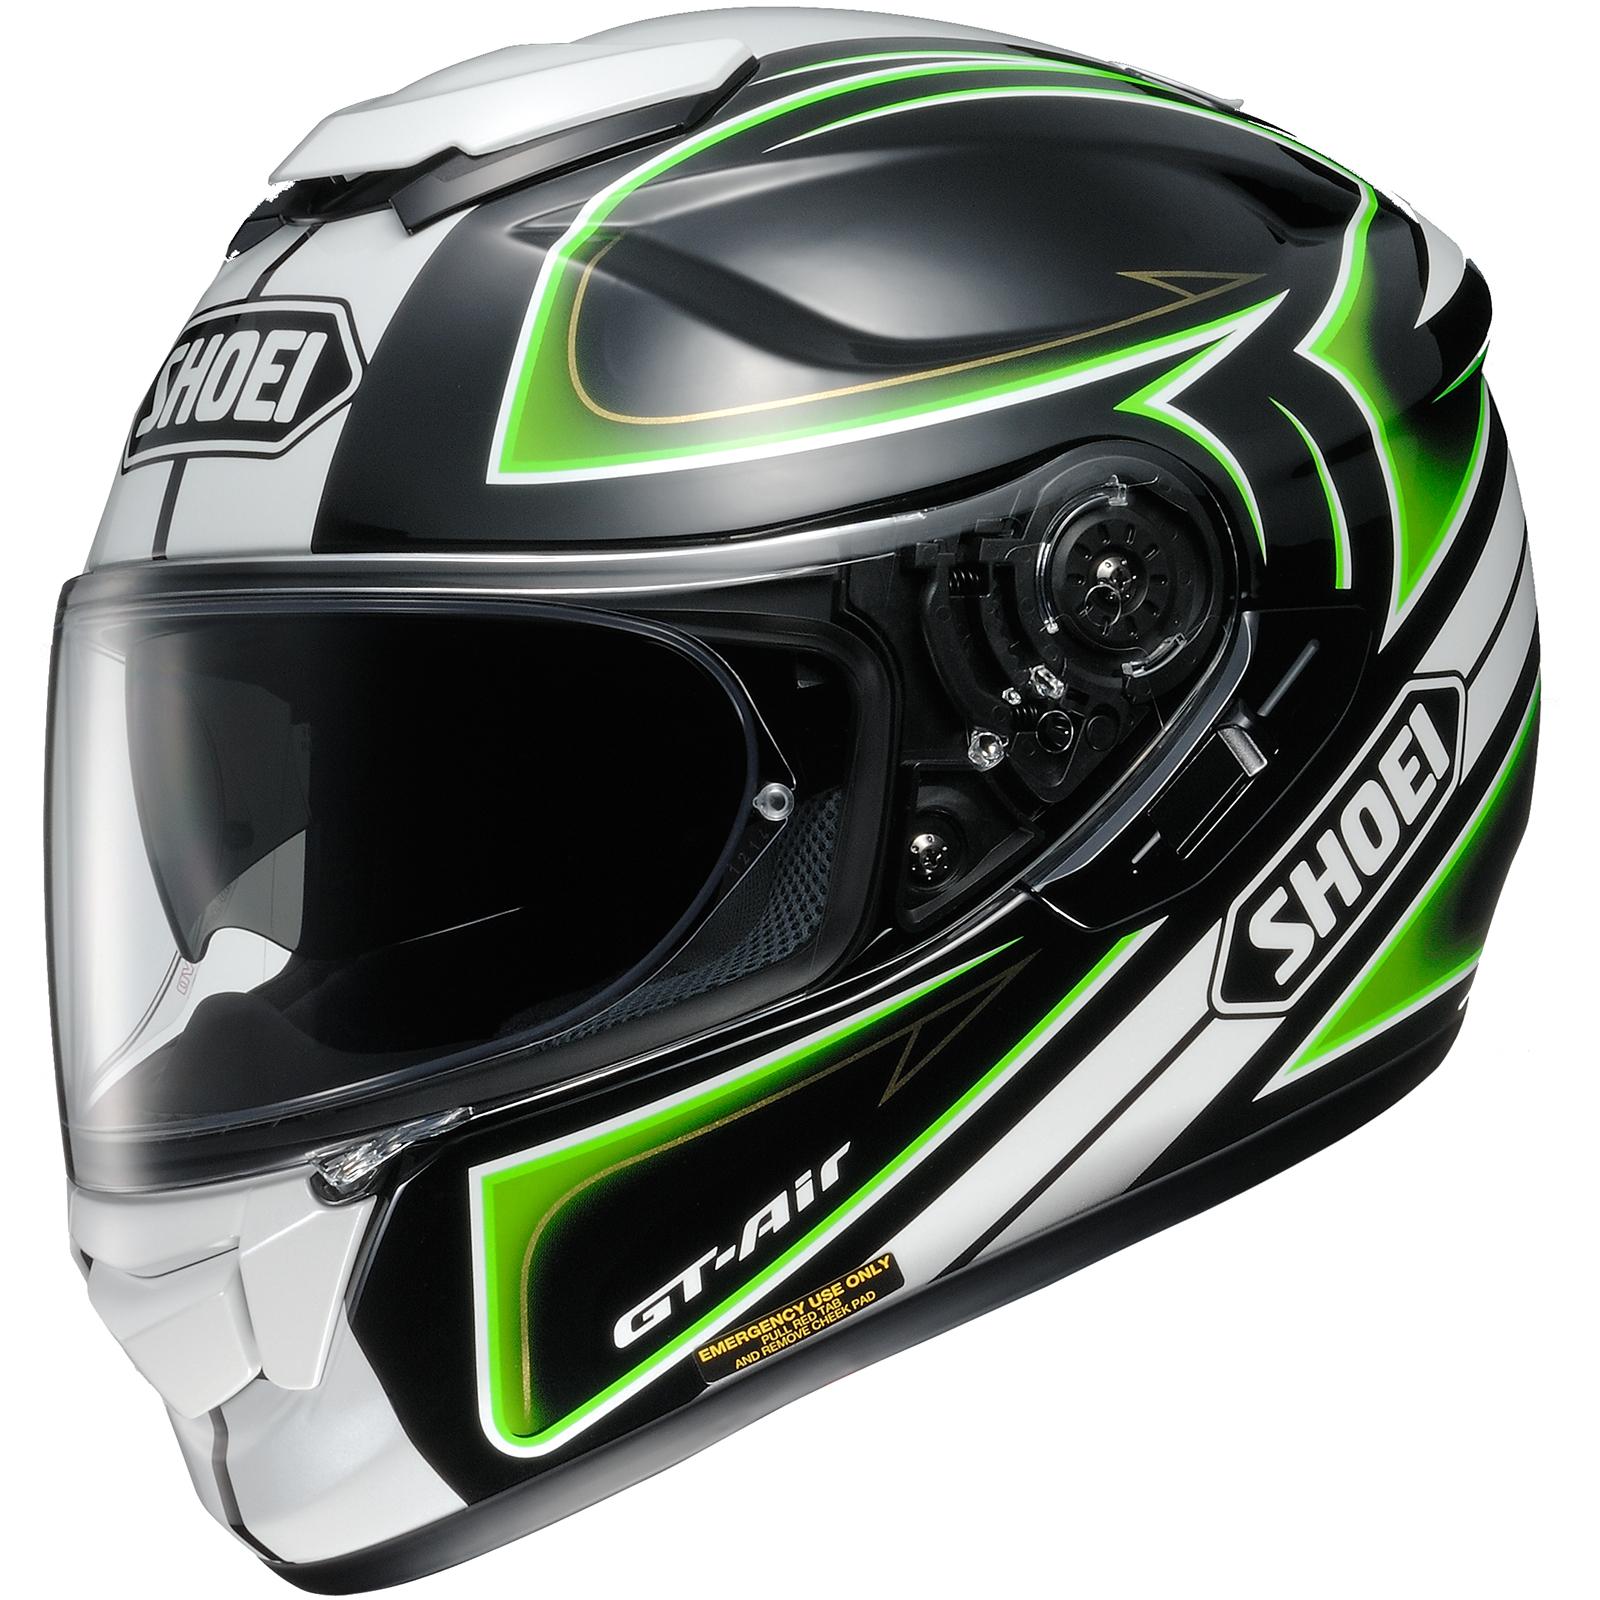 shoei gt air expanse white black green motorcycle helmet visor motorbike race ebay. Black Bedroom Furniture Sets. Home Design Ideas